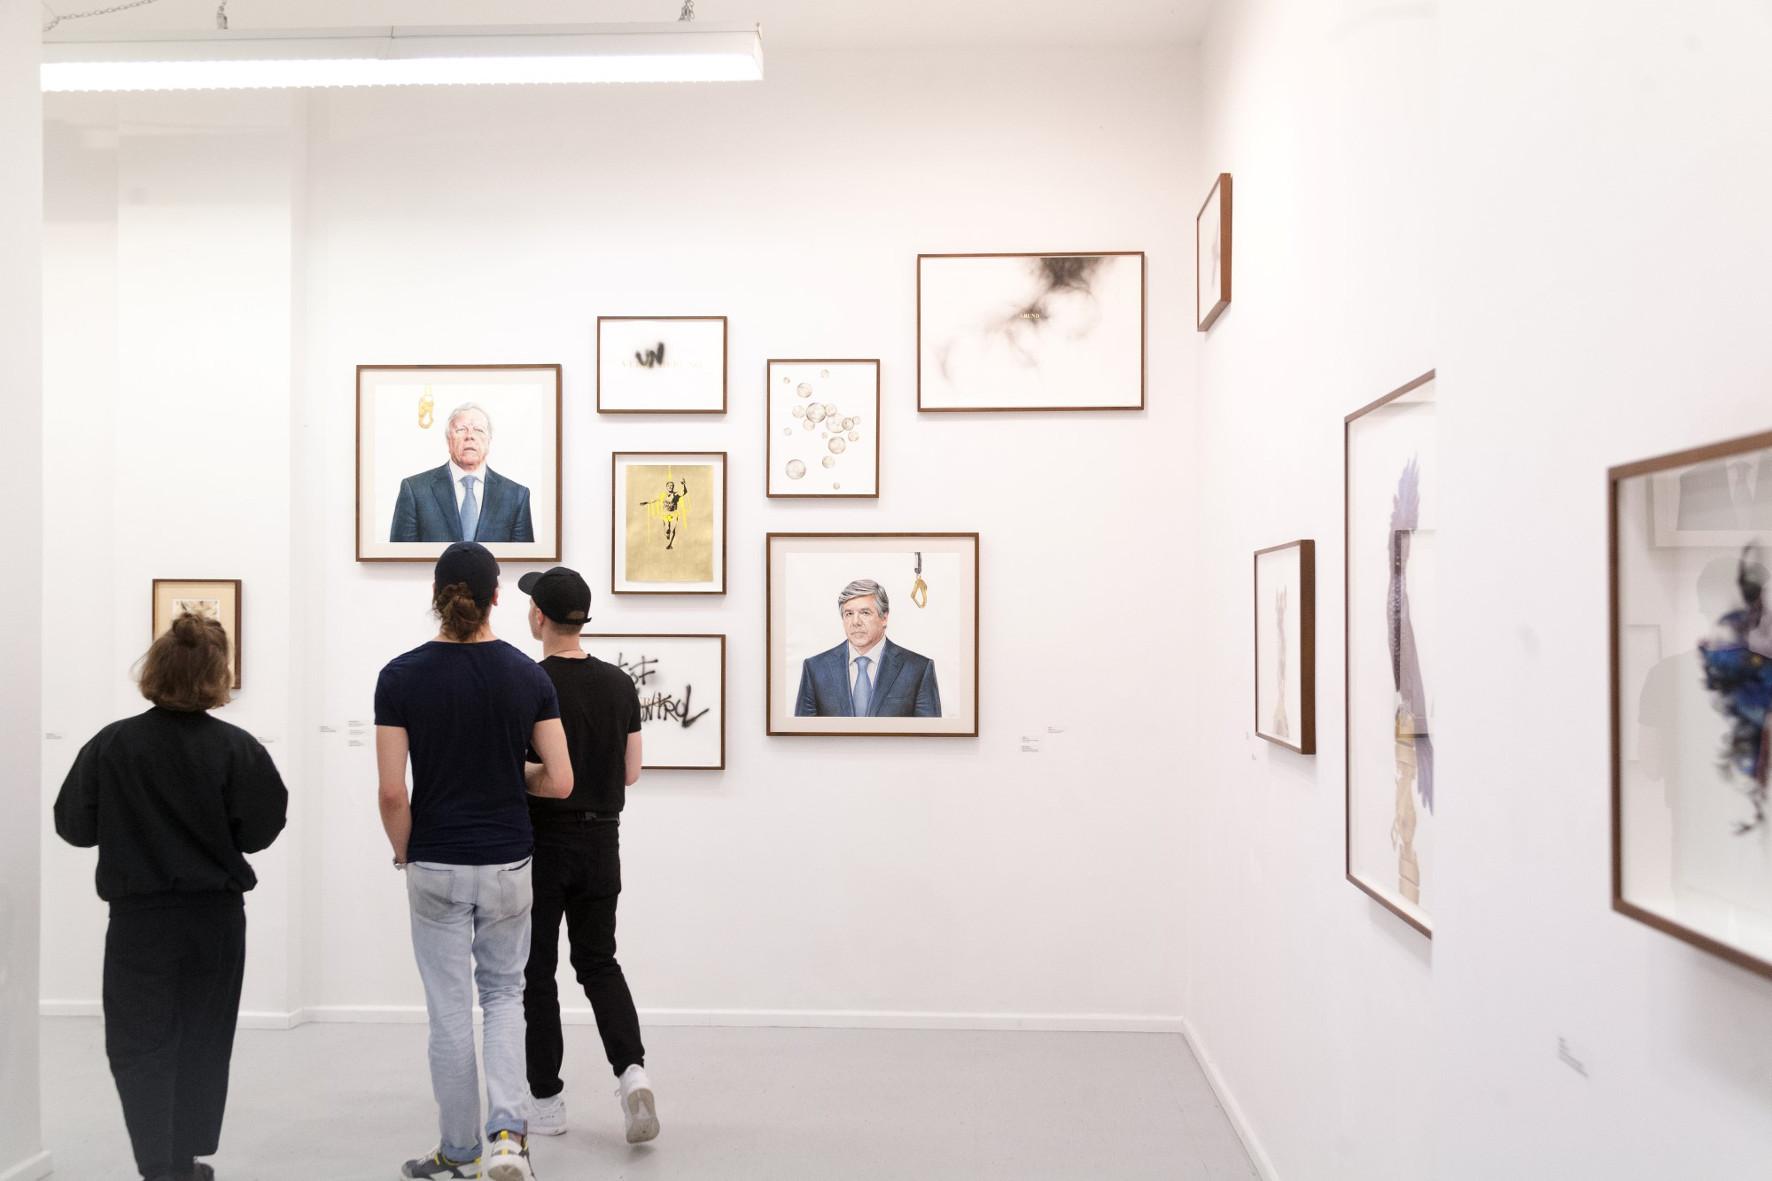 Exhibition, Galerie Kuchling, Berlin, 2019 Karl-Marx Allee 123